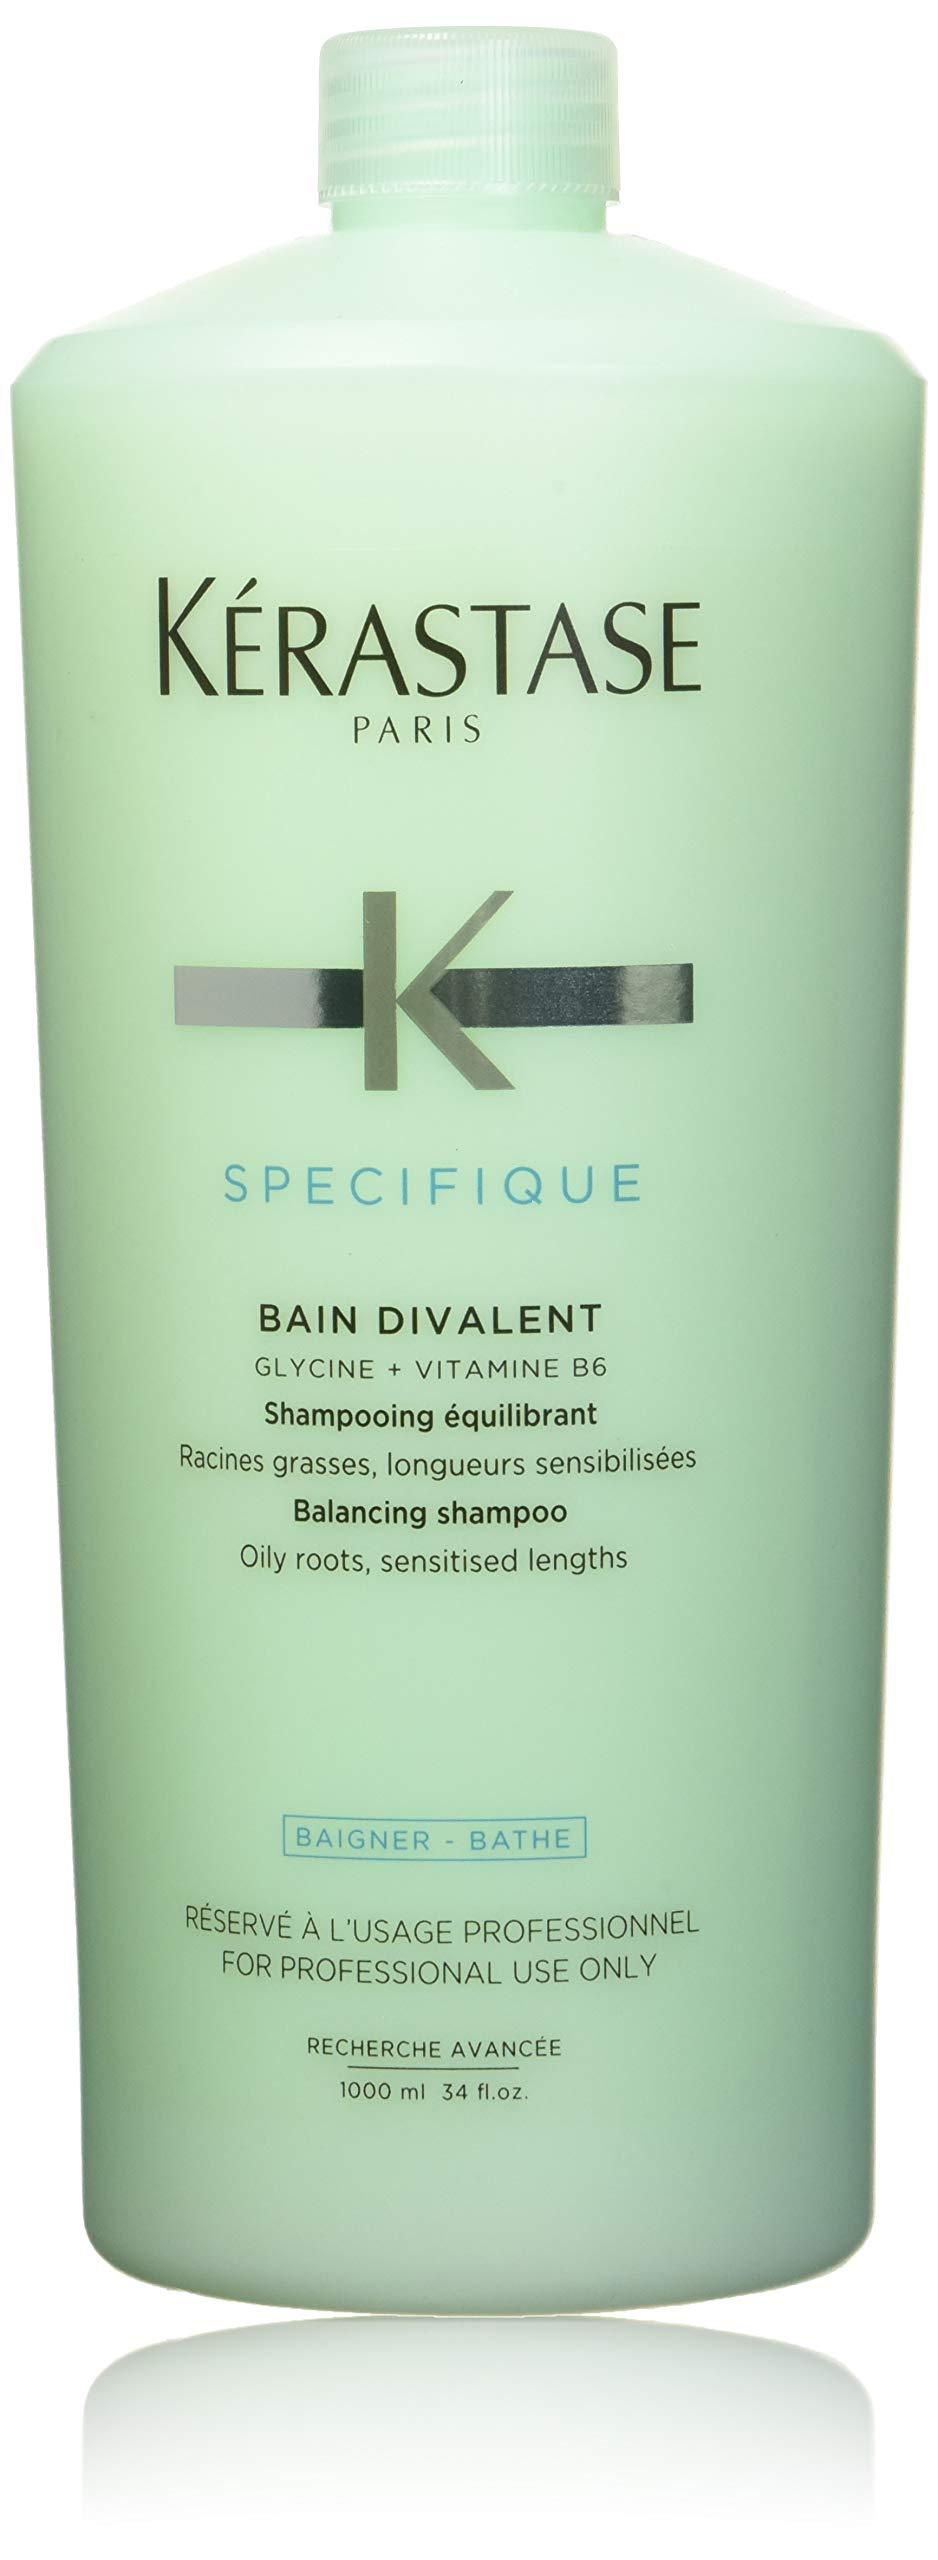 KERASTASE Bain Divalent Shampoo, Multicolor, Fresh, 34 Fl.Oz